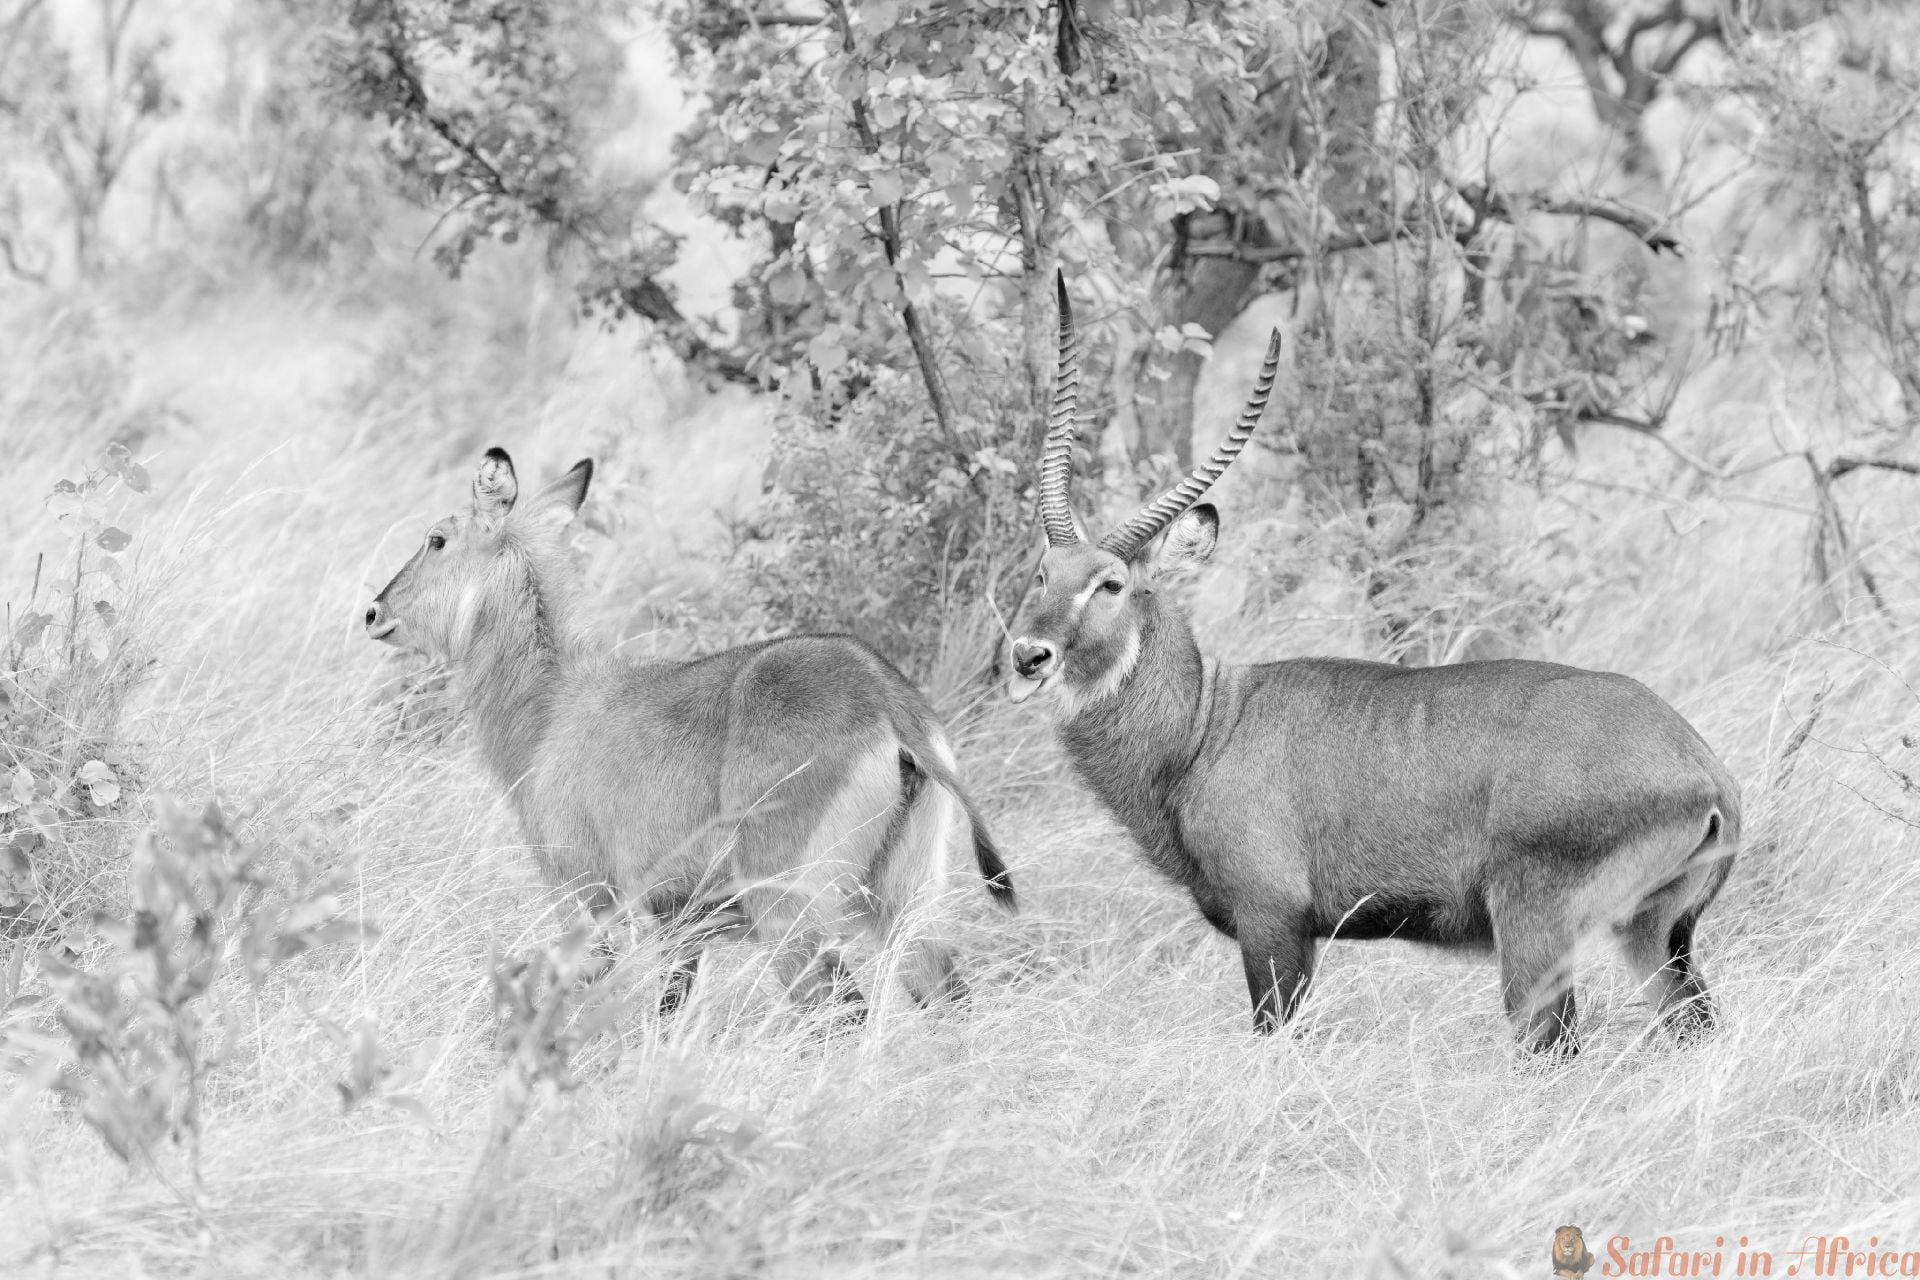 Mannelijke en vrouwelijke Waterbucks Kobus ellipsiprymnus defassa in verkering, Akagera National Park, Rwanda B&W